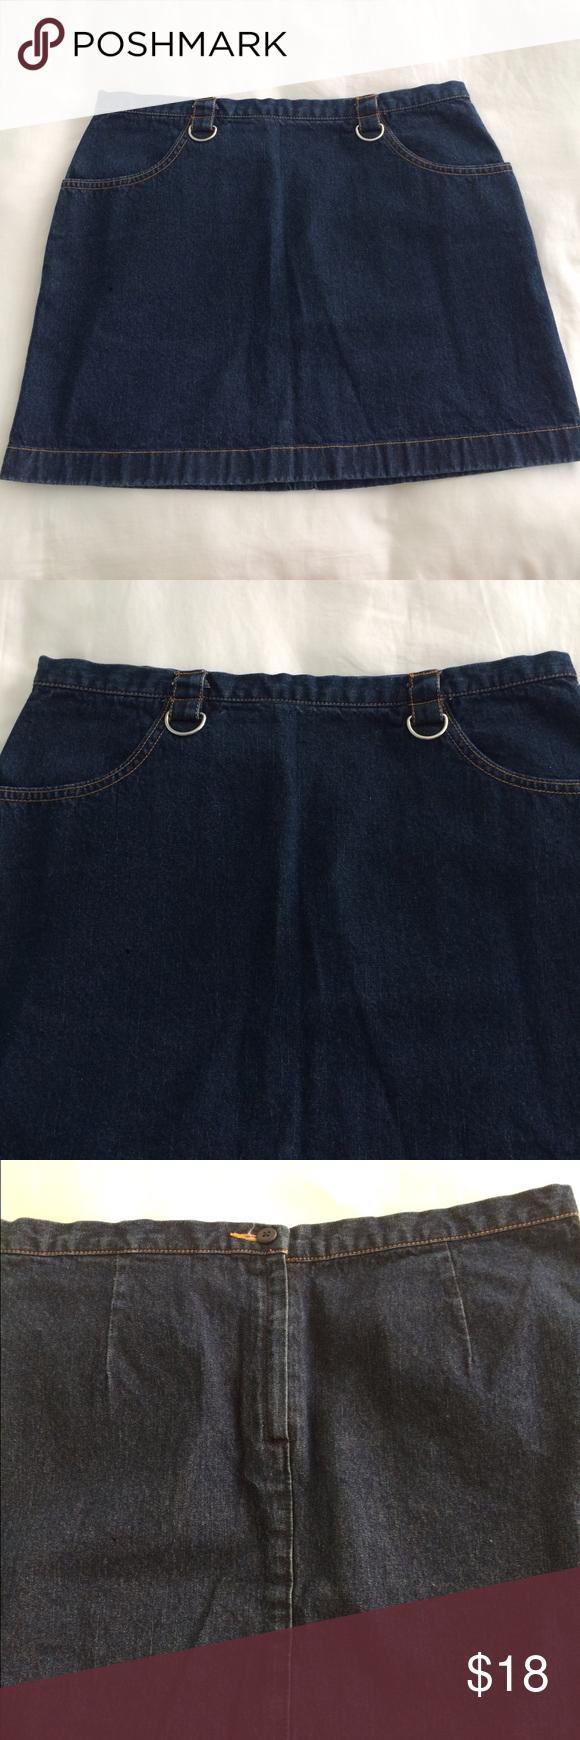 "Denim skirt   vintage  brandy Melville look alike Denim skirt with pockets and two silver belt hoops. Size M - similar to brandy Melville- measures 15"" long Skirts Mini"